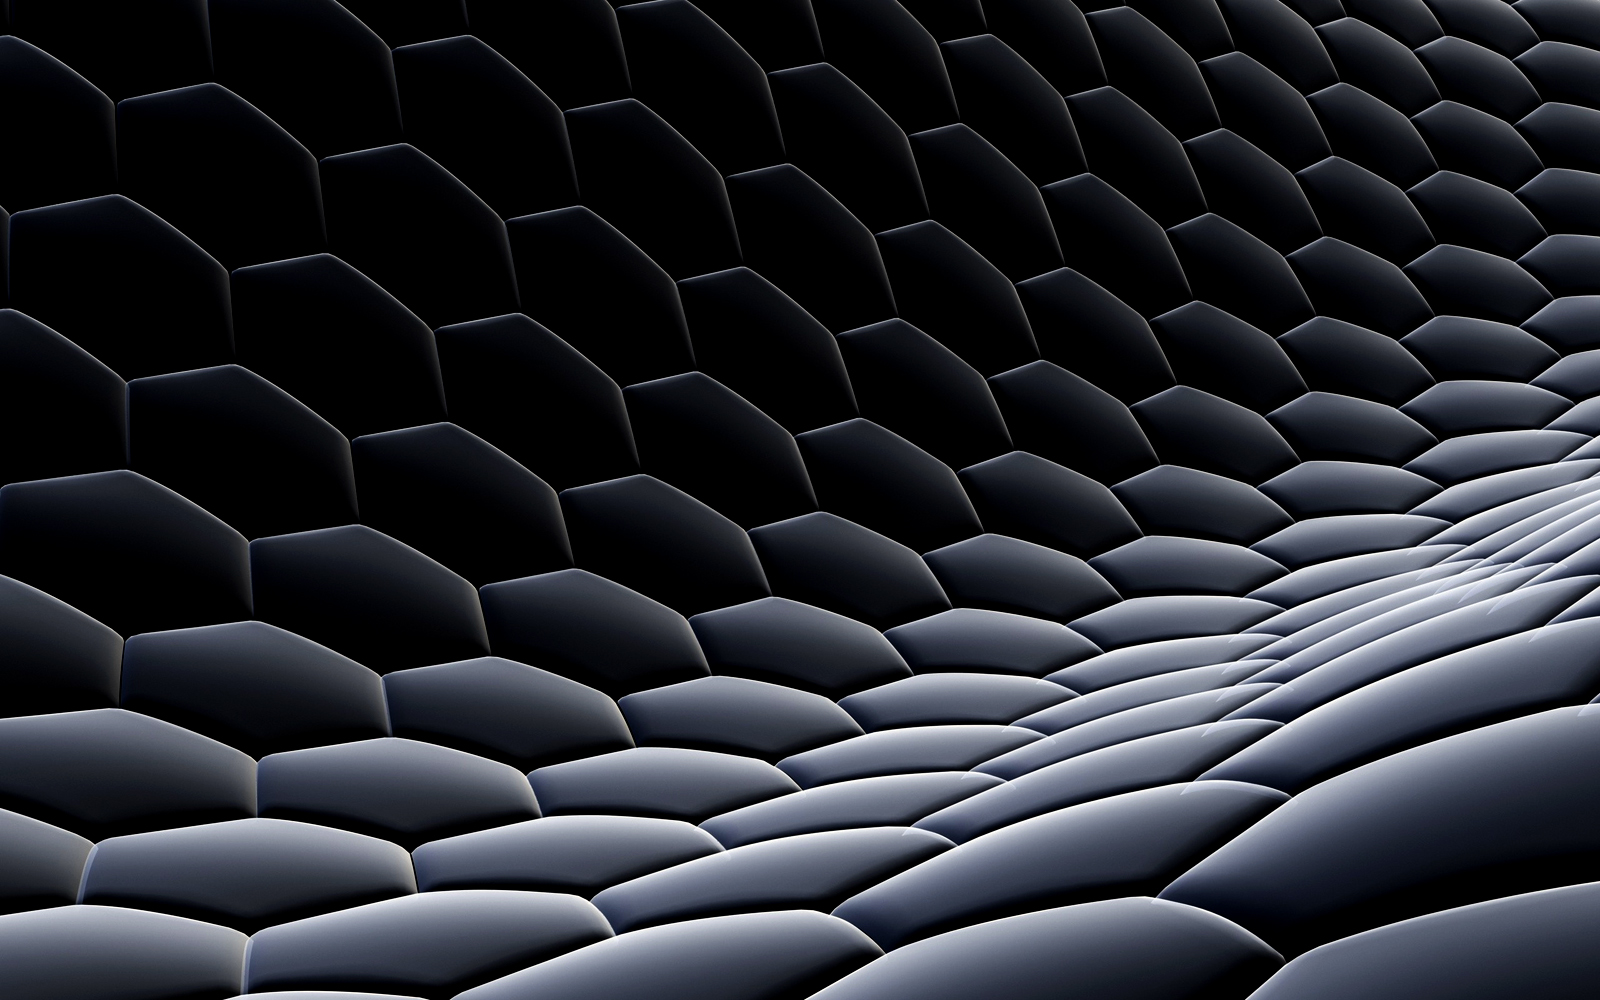 3D Hexagon Blocks HD Wallpapers